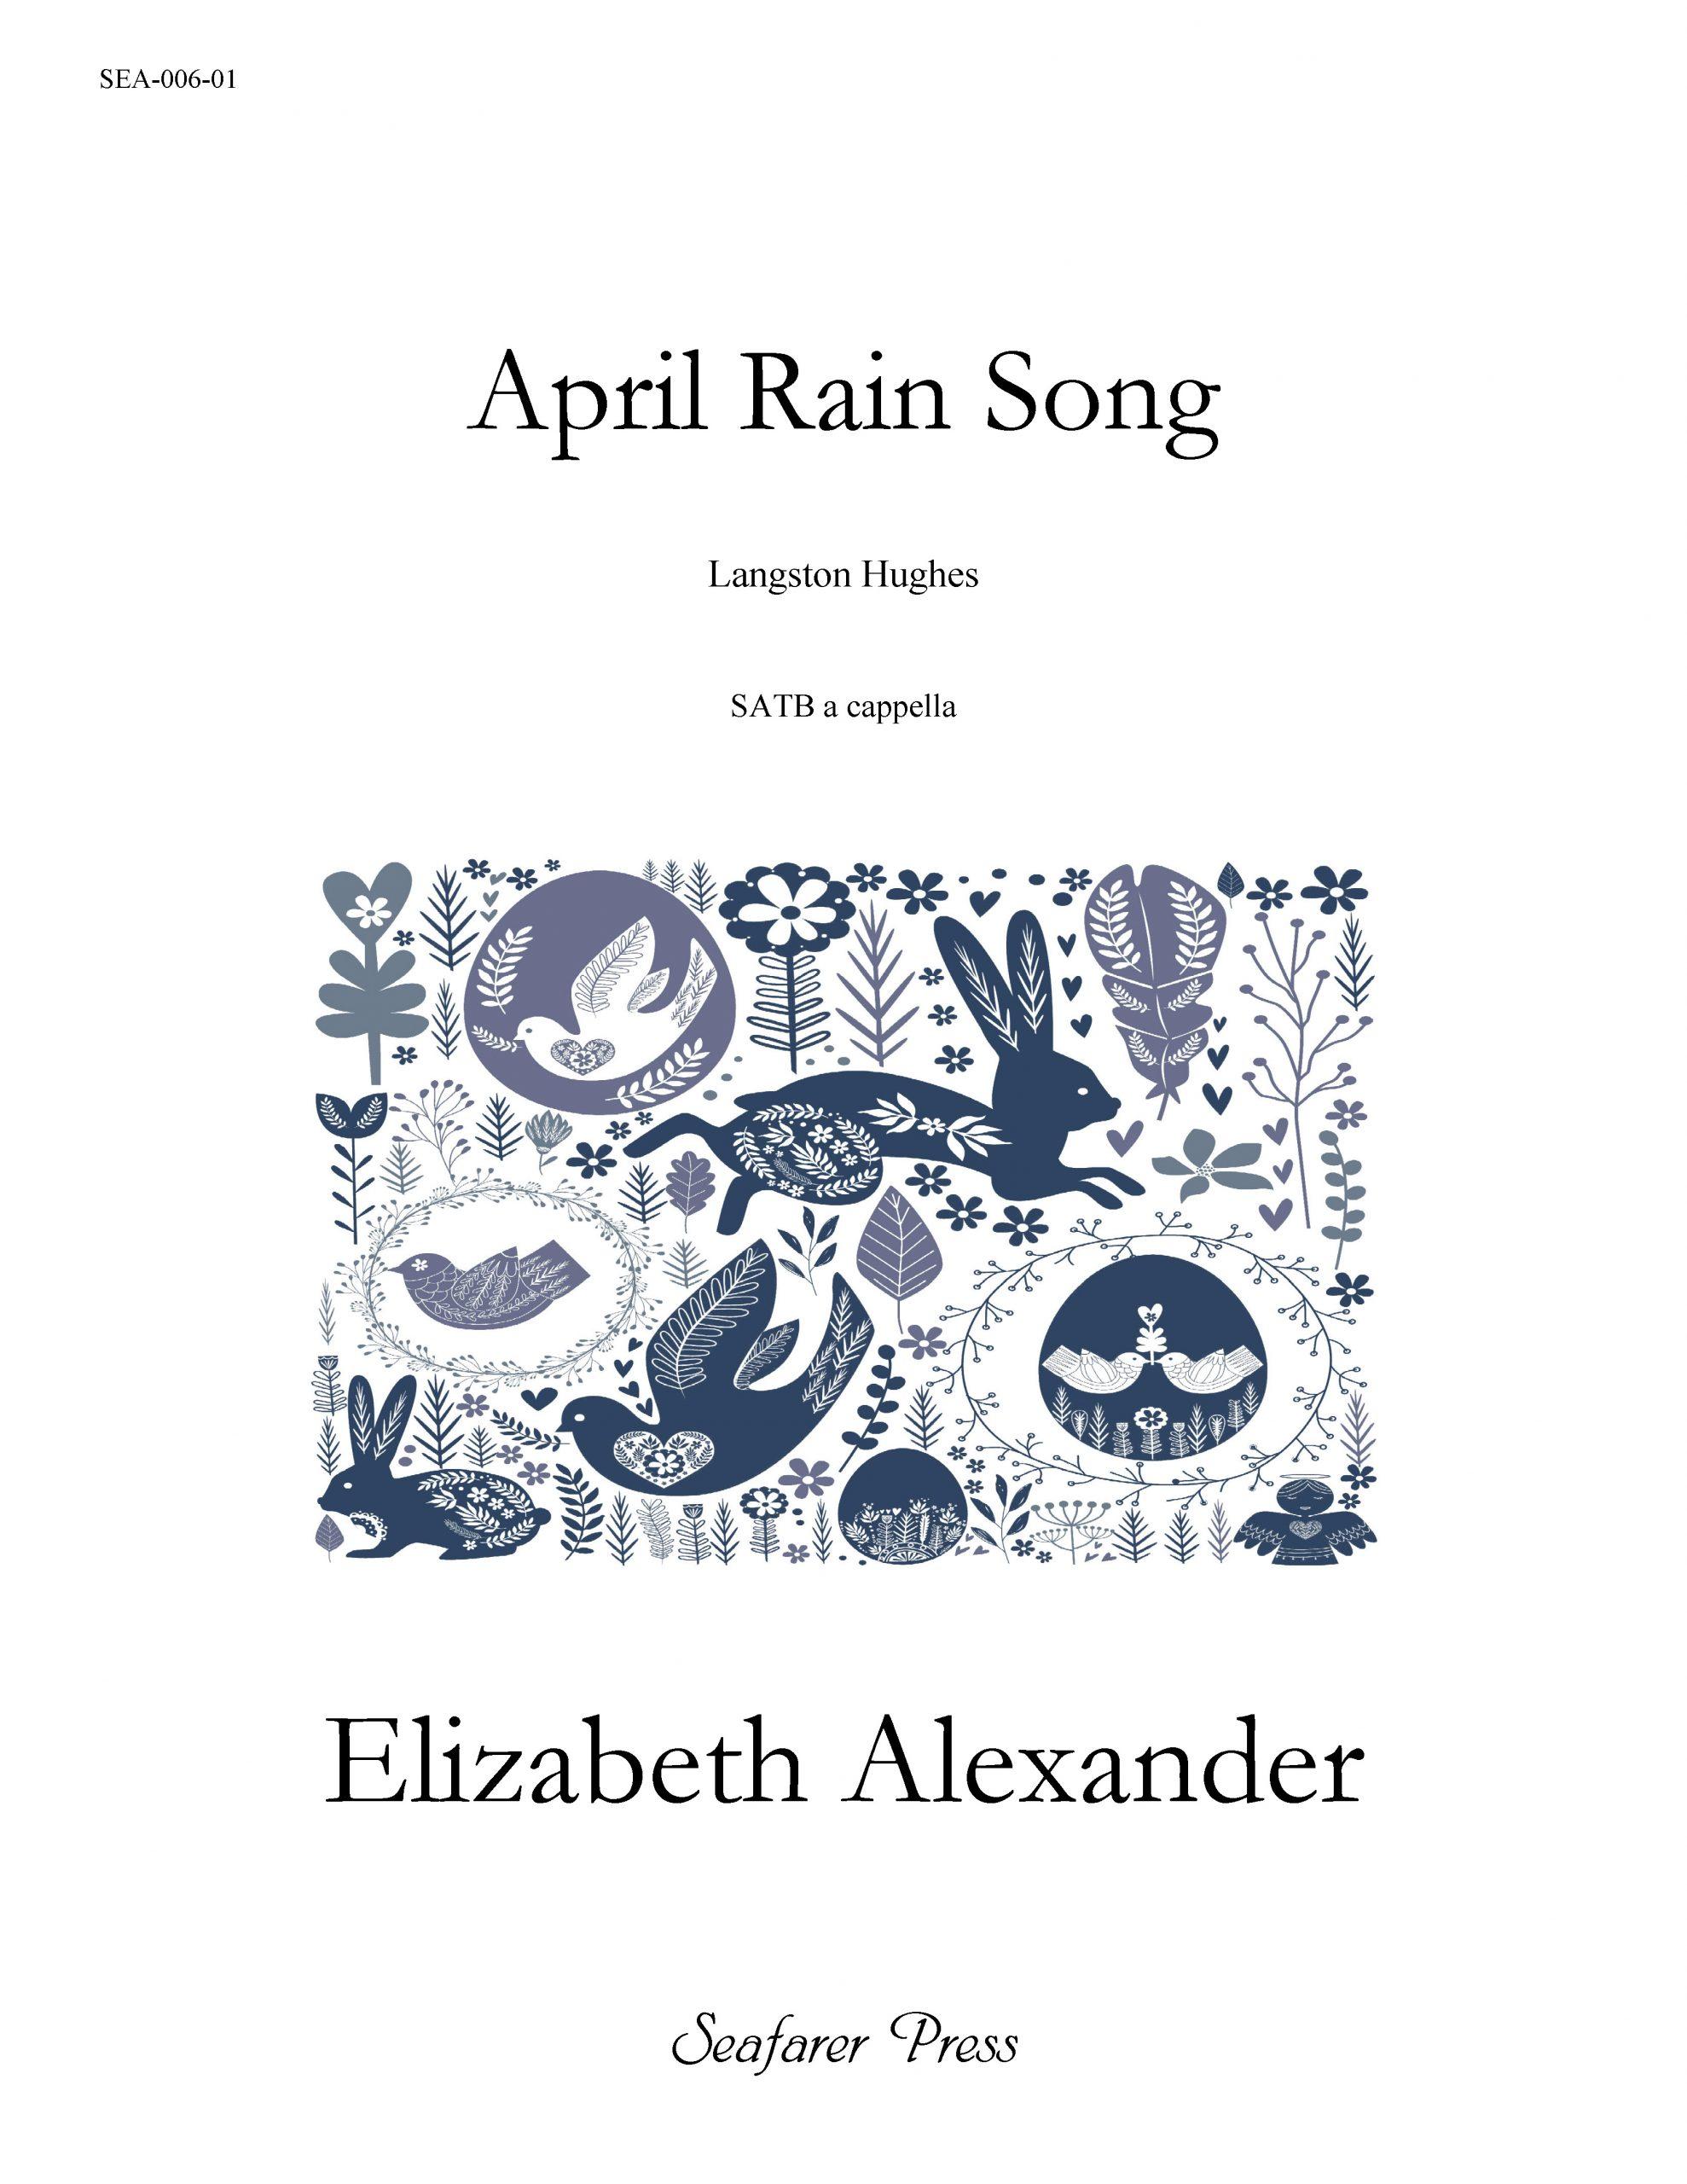 SEA-006-01 - April Rain Song